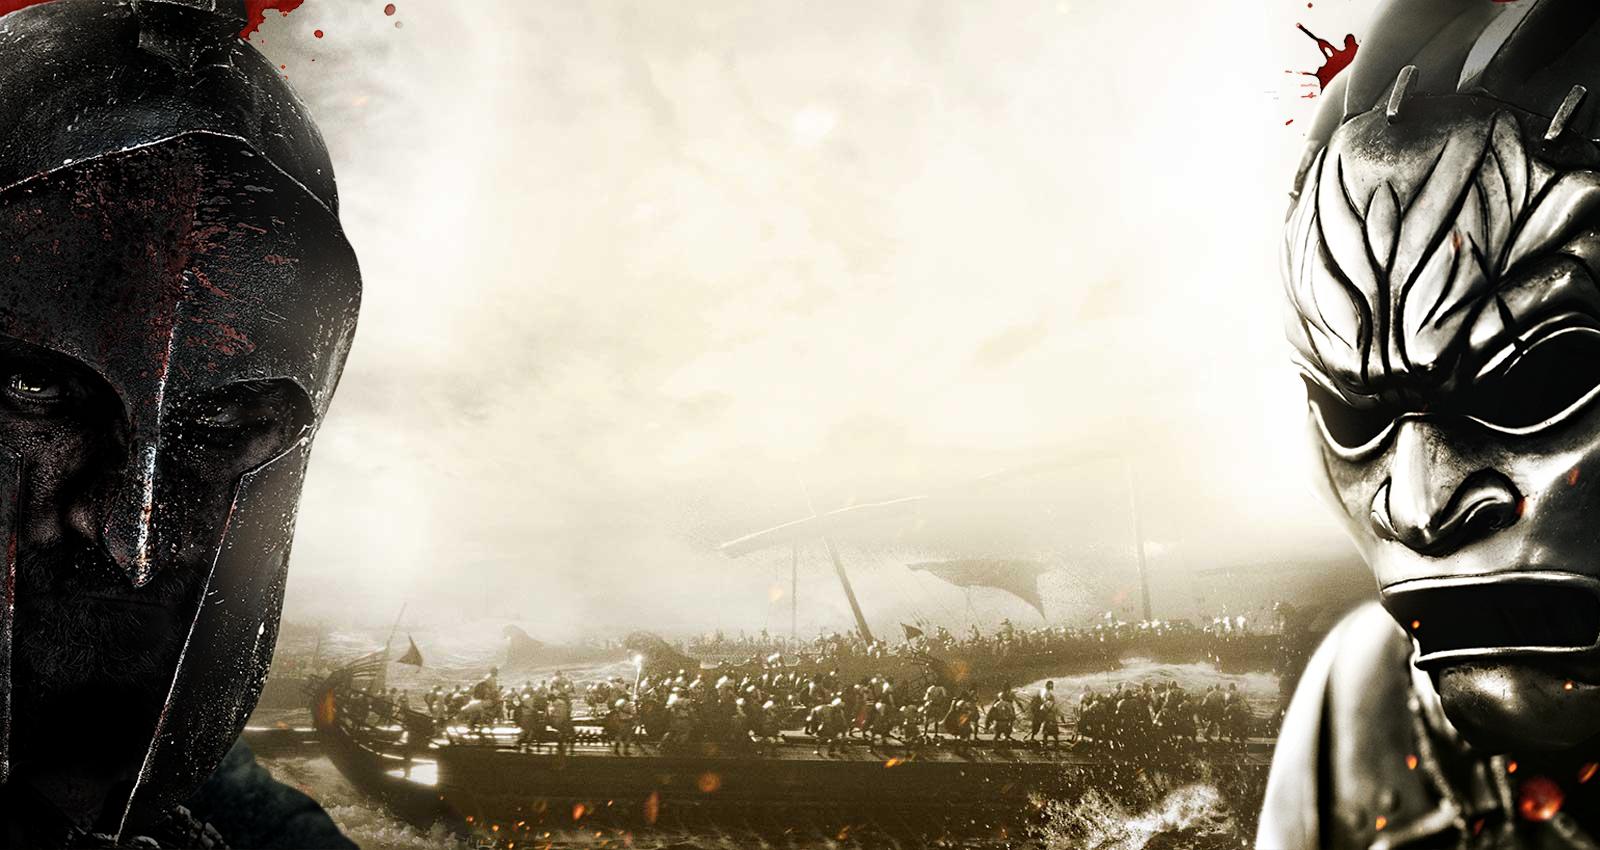 Twilight Breaking Dawn Part 2 Wallpaper Hd 300 Rise Of An Empire 2014 Movies Maniac